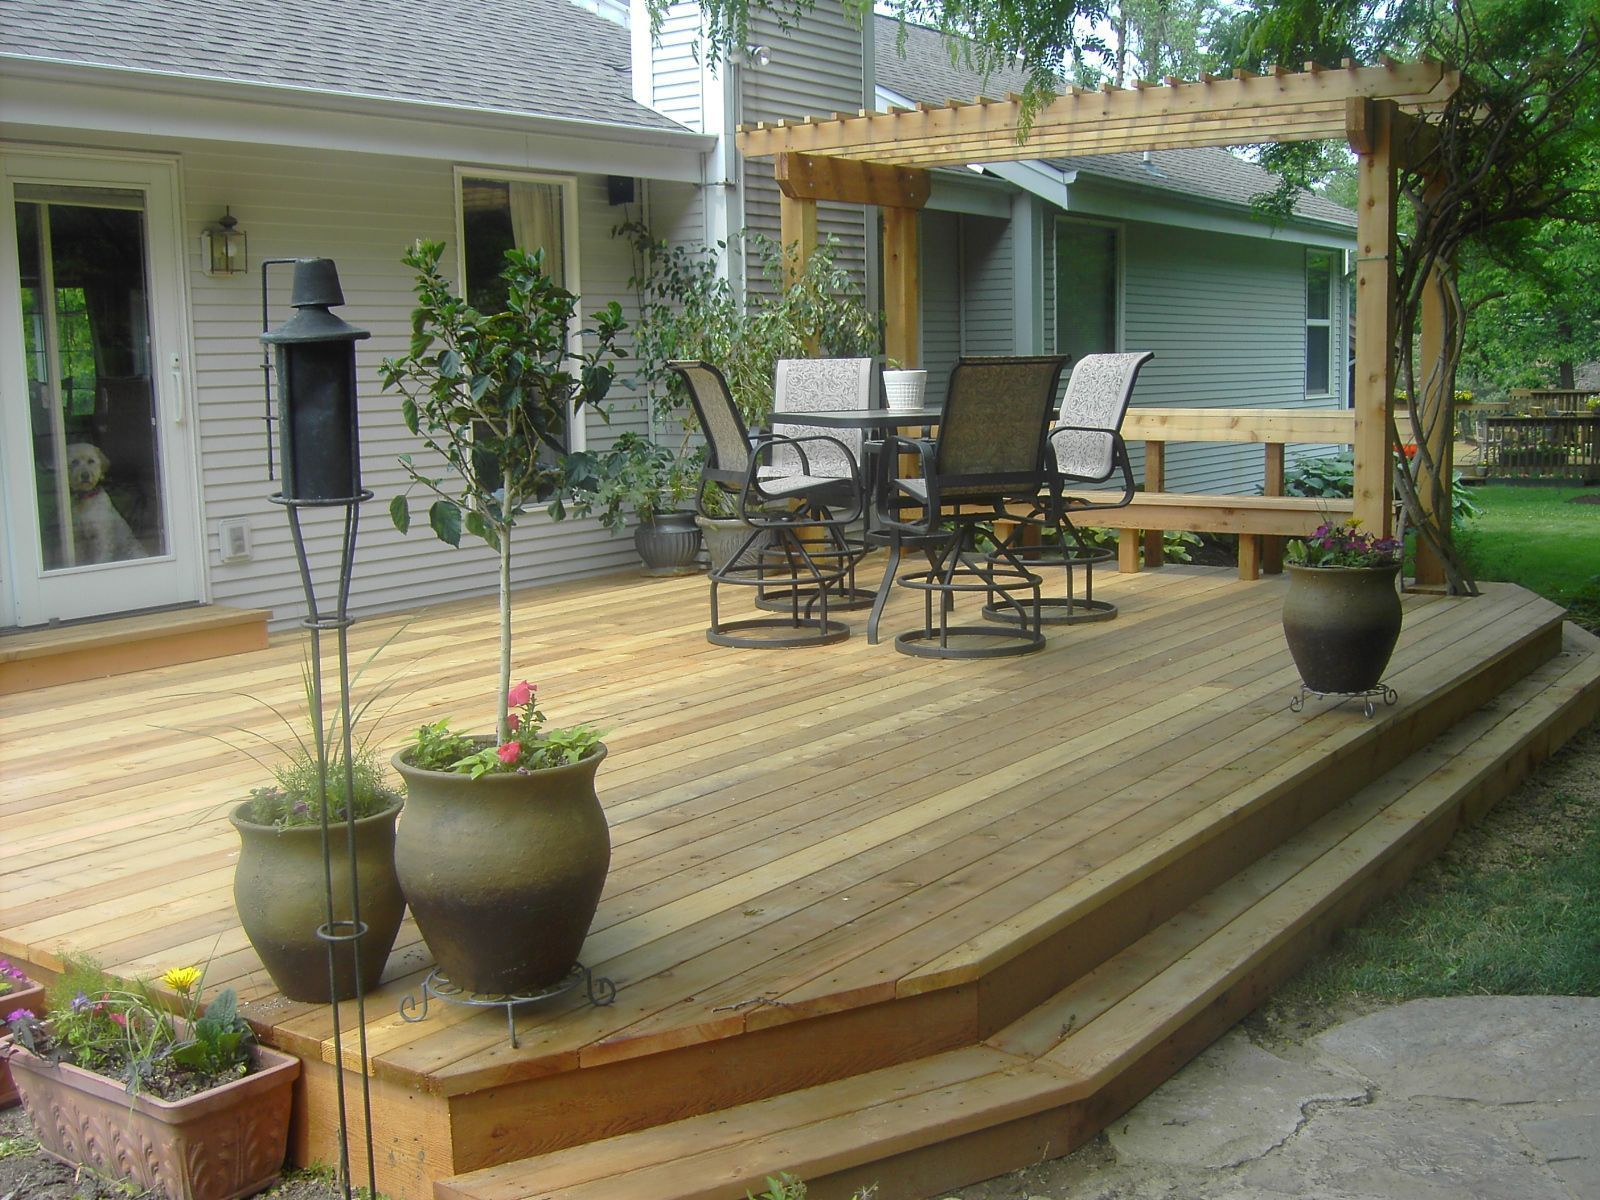 Back Porch Ideas And Photos To Inspire Your Next Home Decor